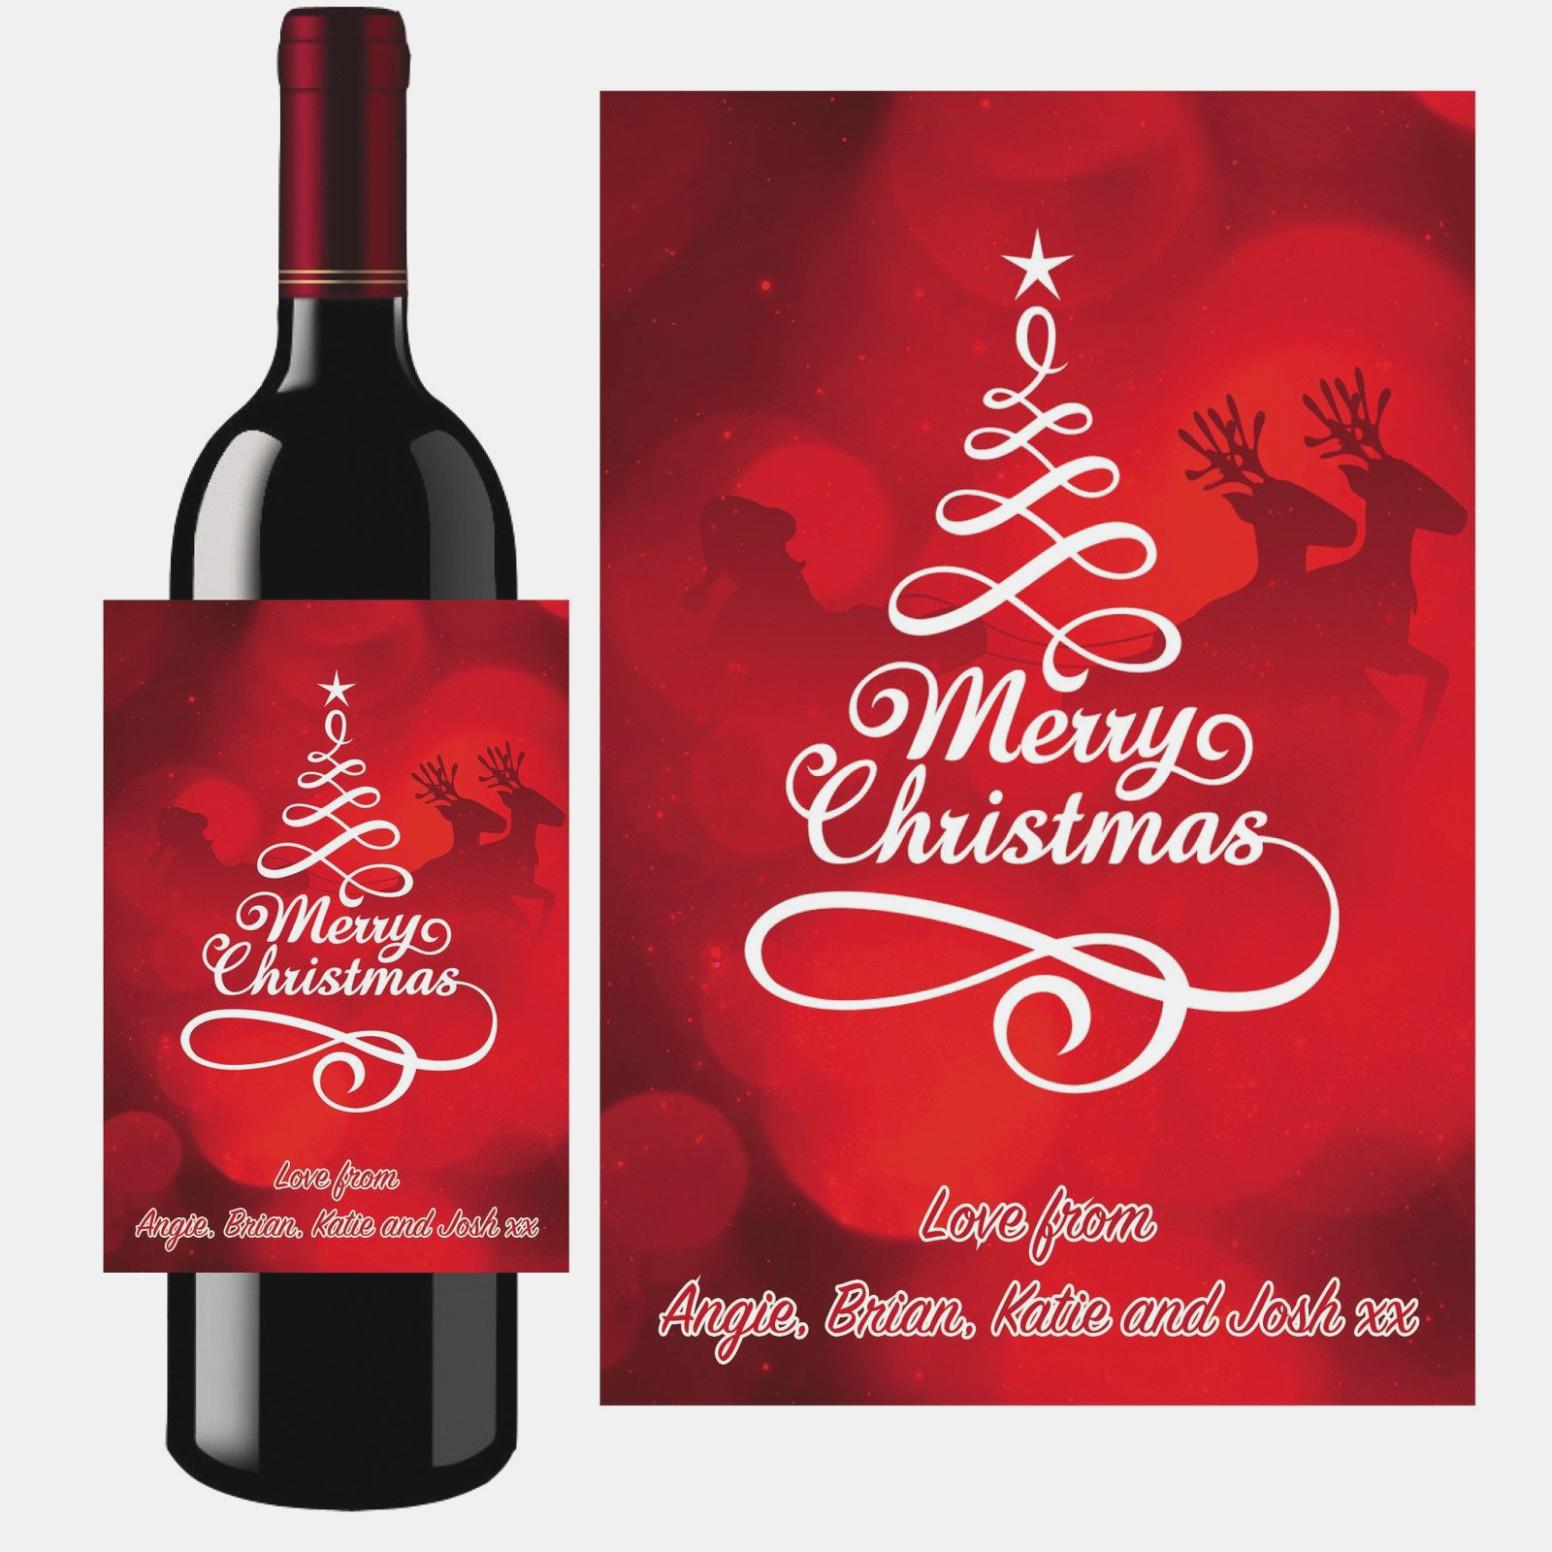 Free Printable Mini Champagne Bottle Labels Wine Bottle Stickers - Free Printable Mini Champagne Bottle Labels